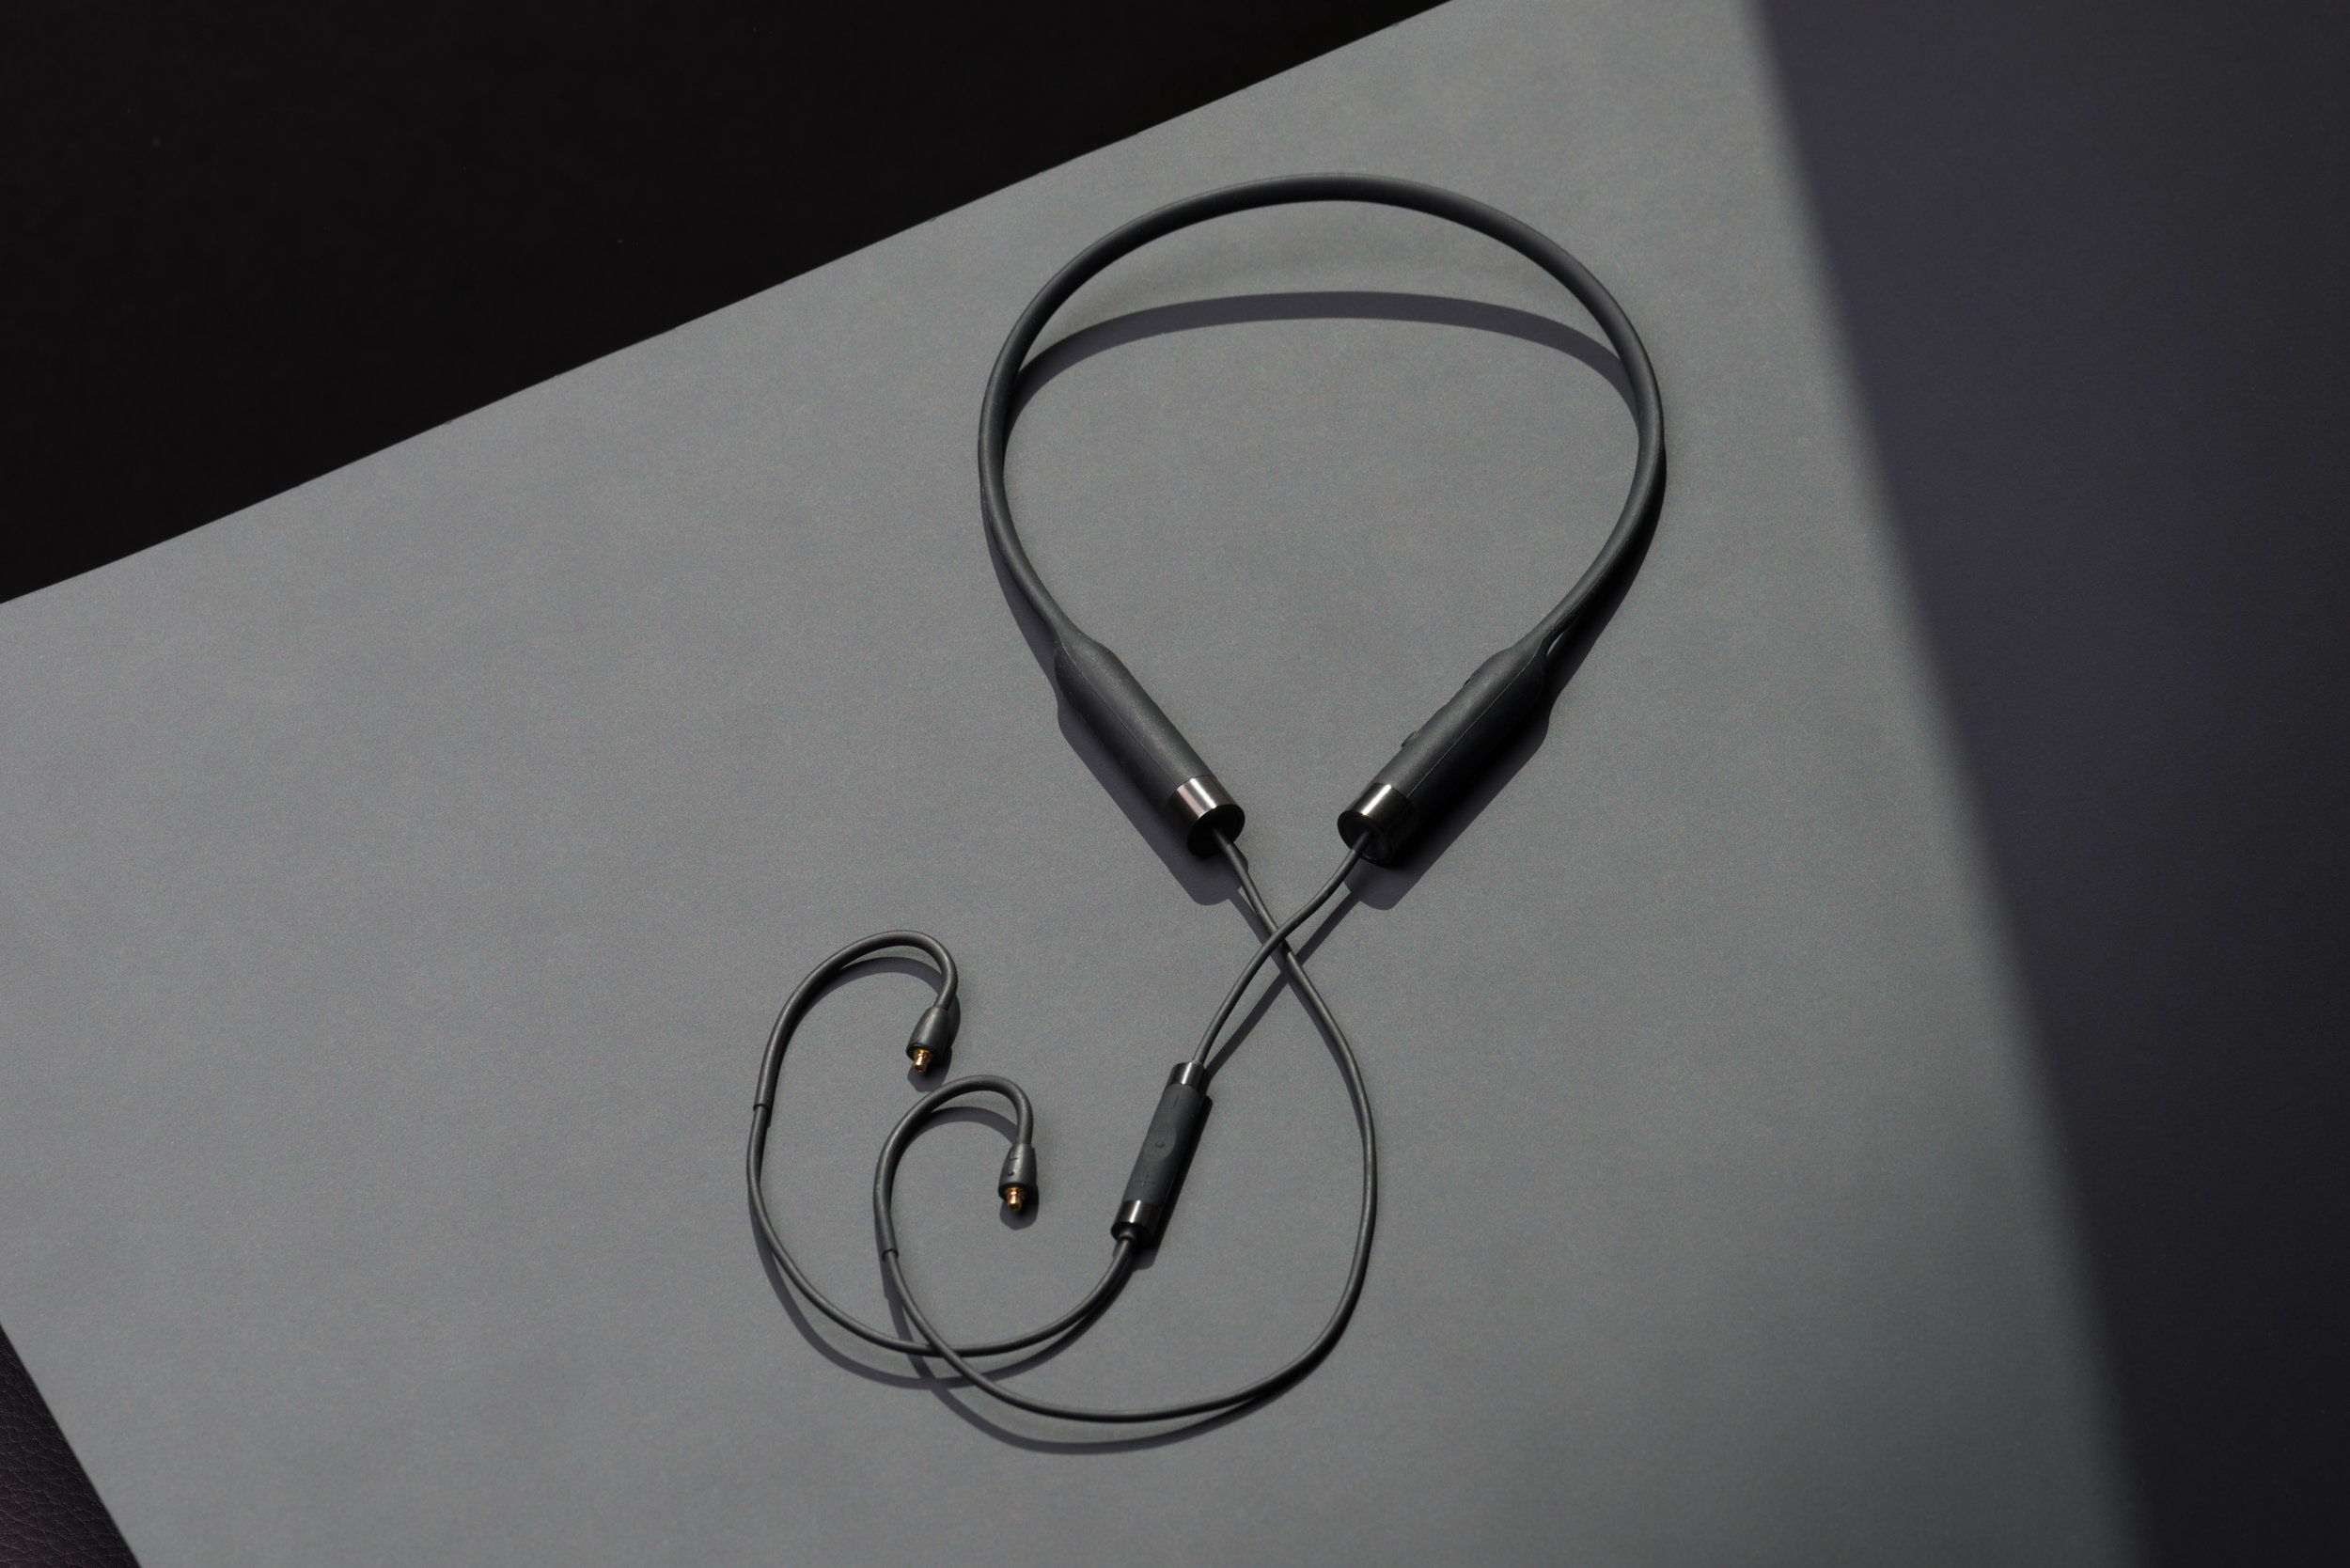 RHA CL2 Planar wireless neckband detail 3.jpg